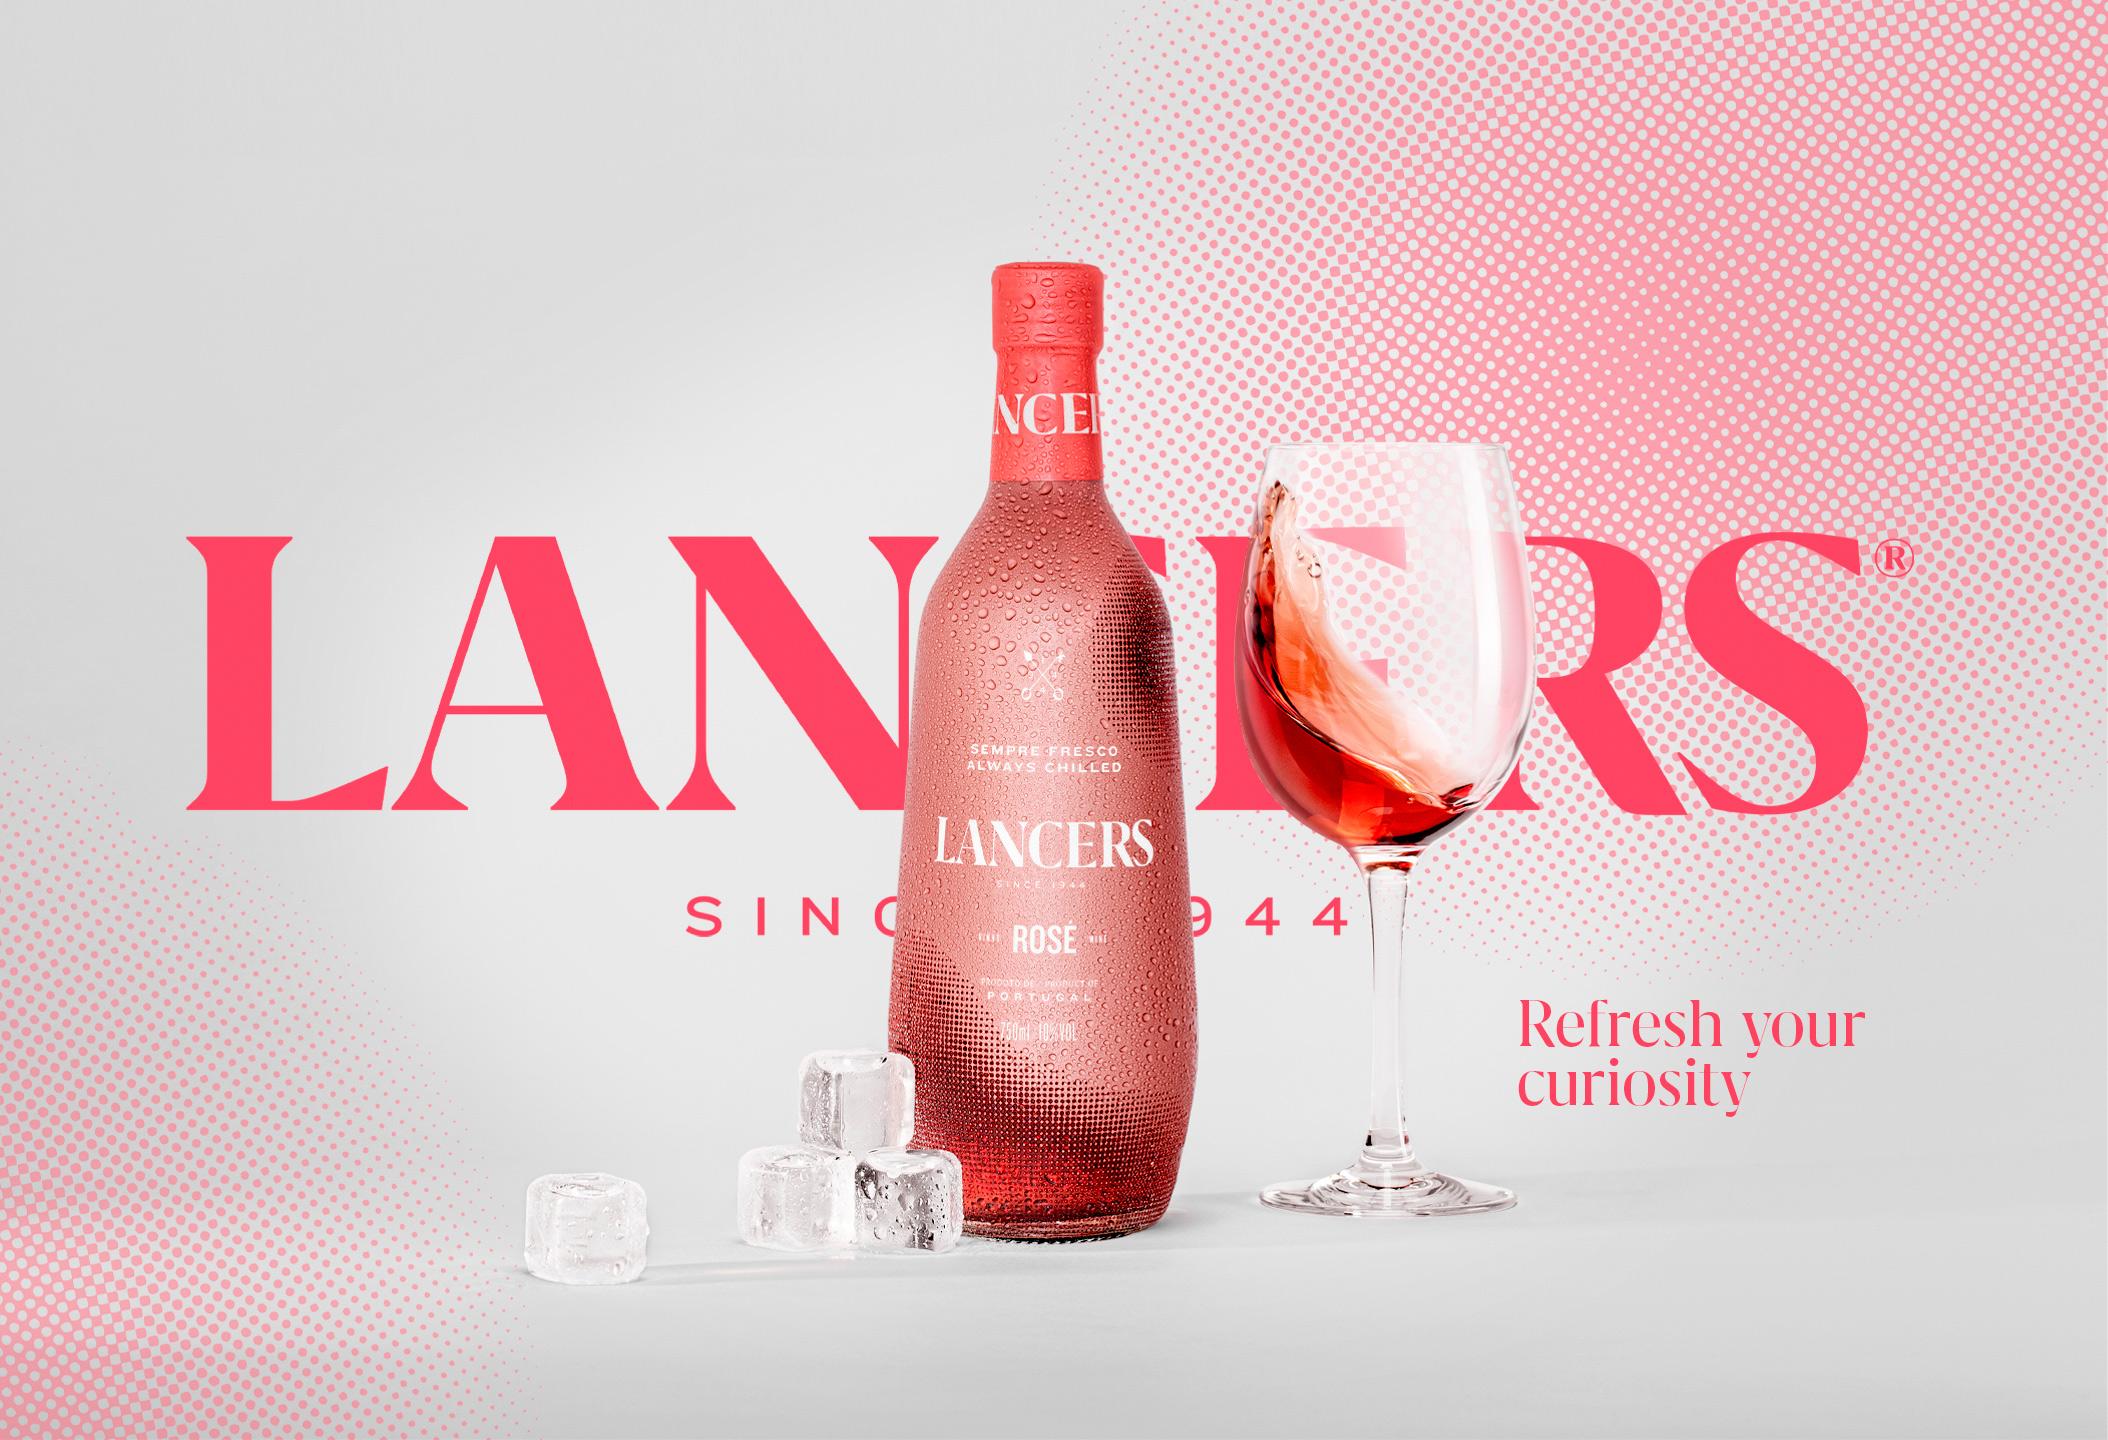 Volta Redesign the Iconic Lancers Wine